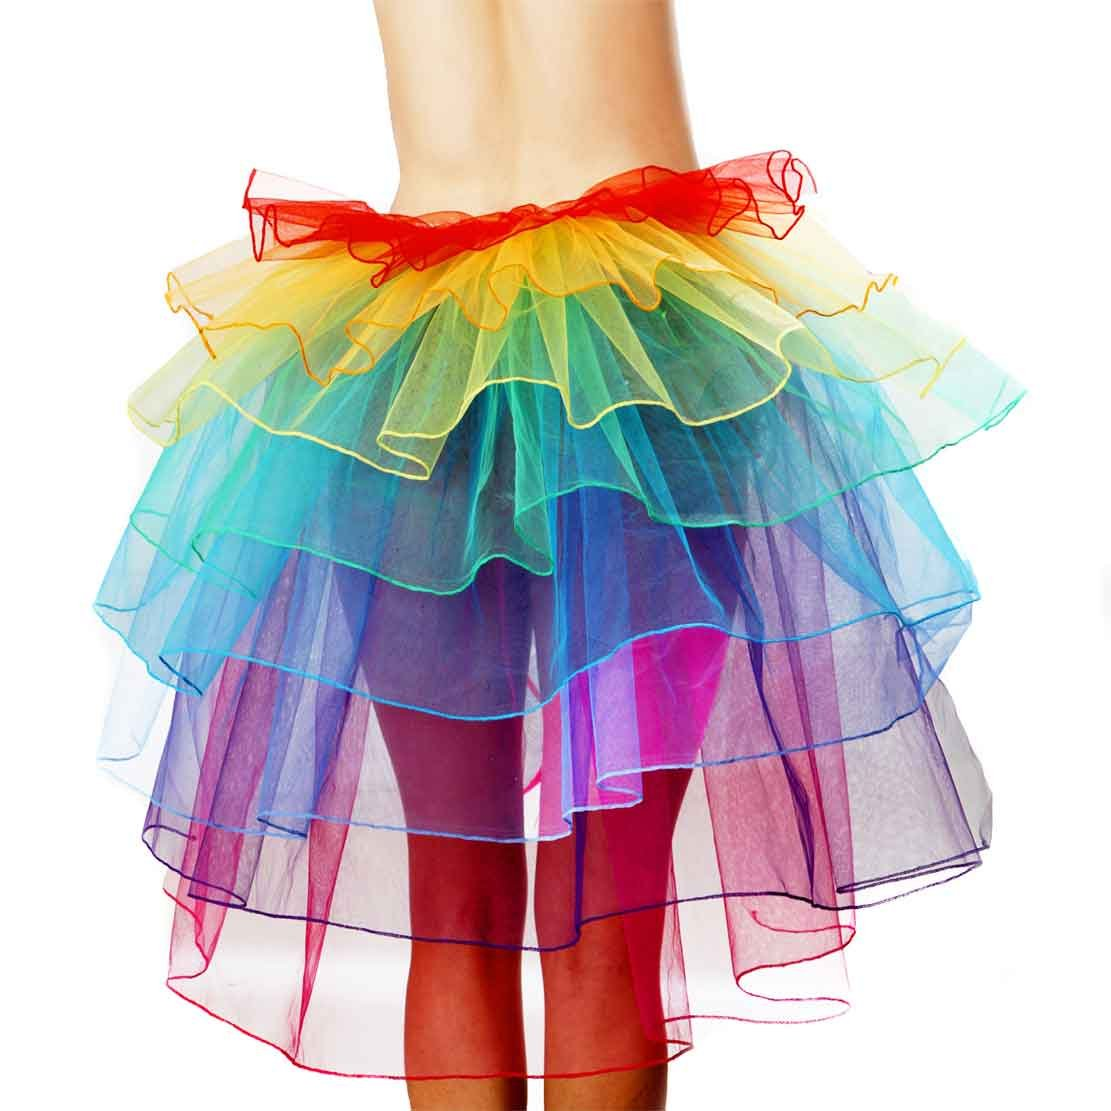 Women's Rainbow Wave Wig Long Gloves Socks 8Layered Tail Tutu Skirt Floral Headband Set (B) by ECOSCO (Image #2)